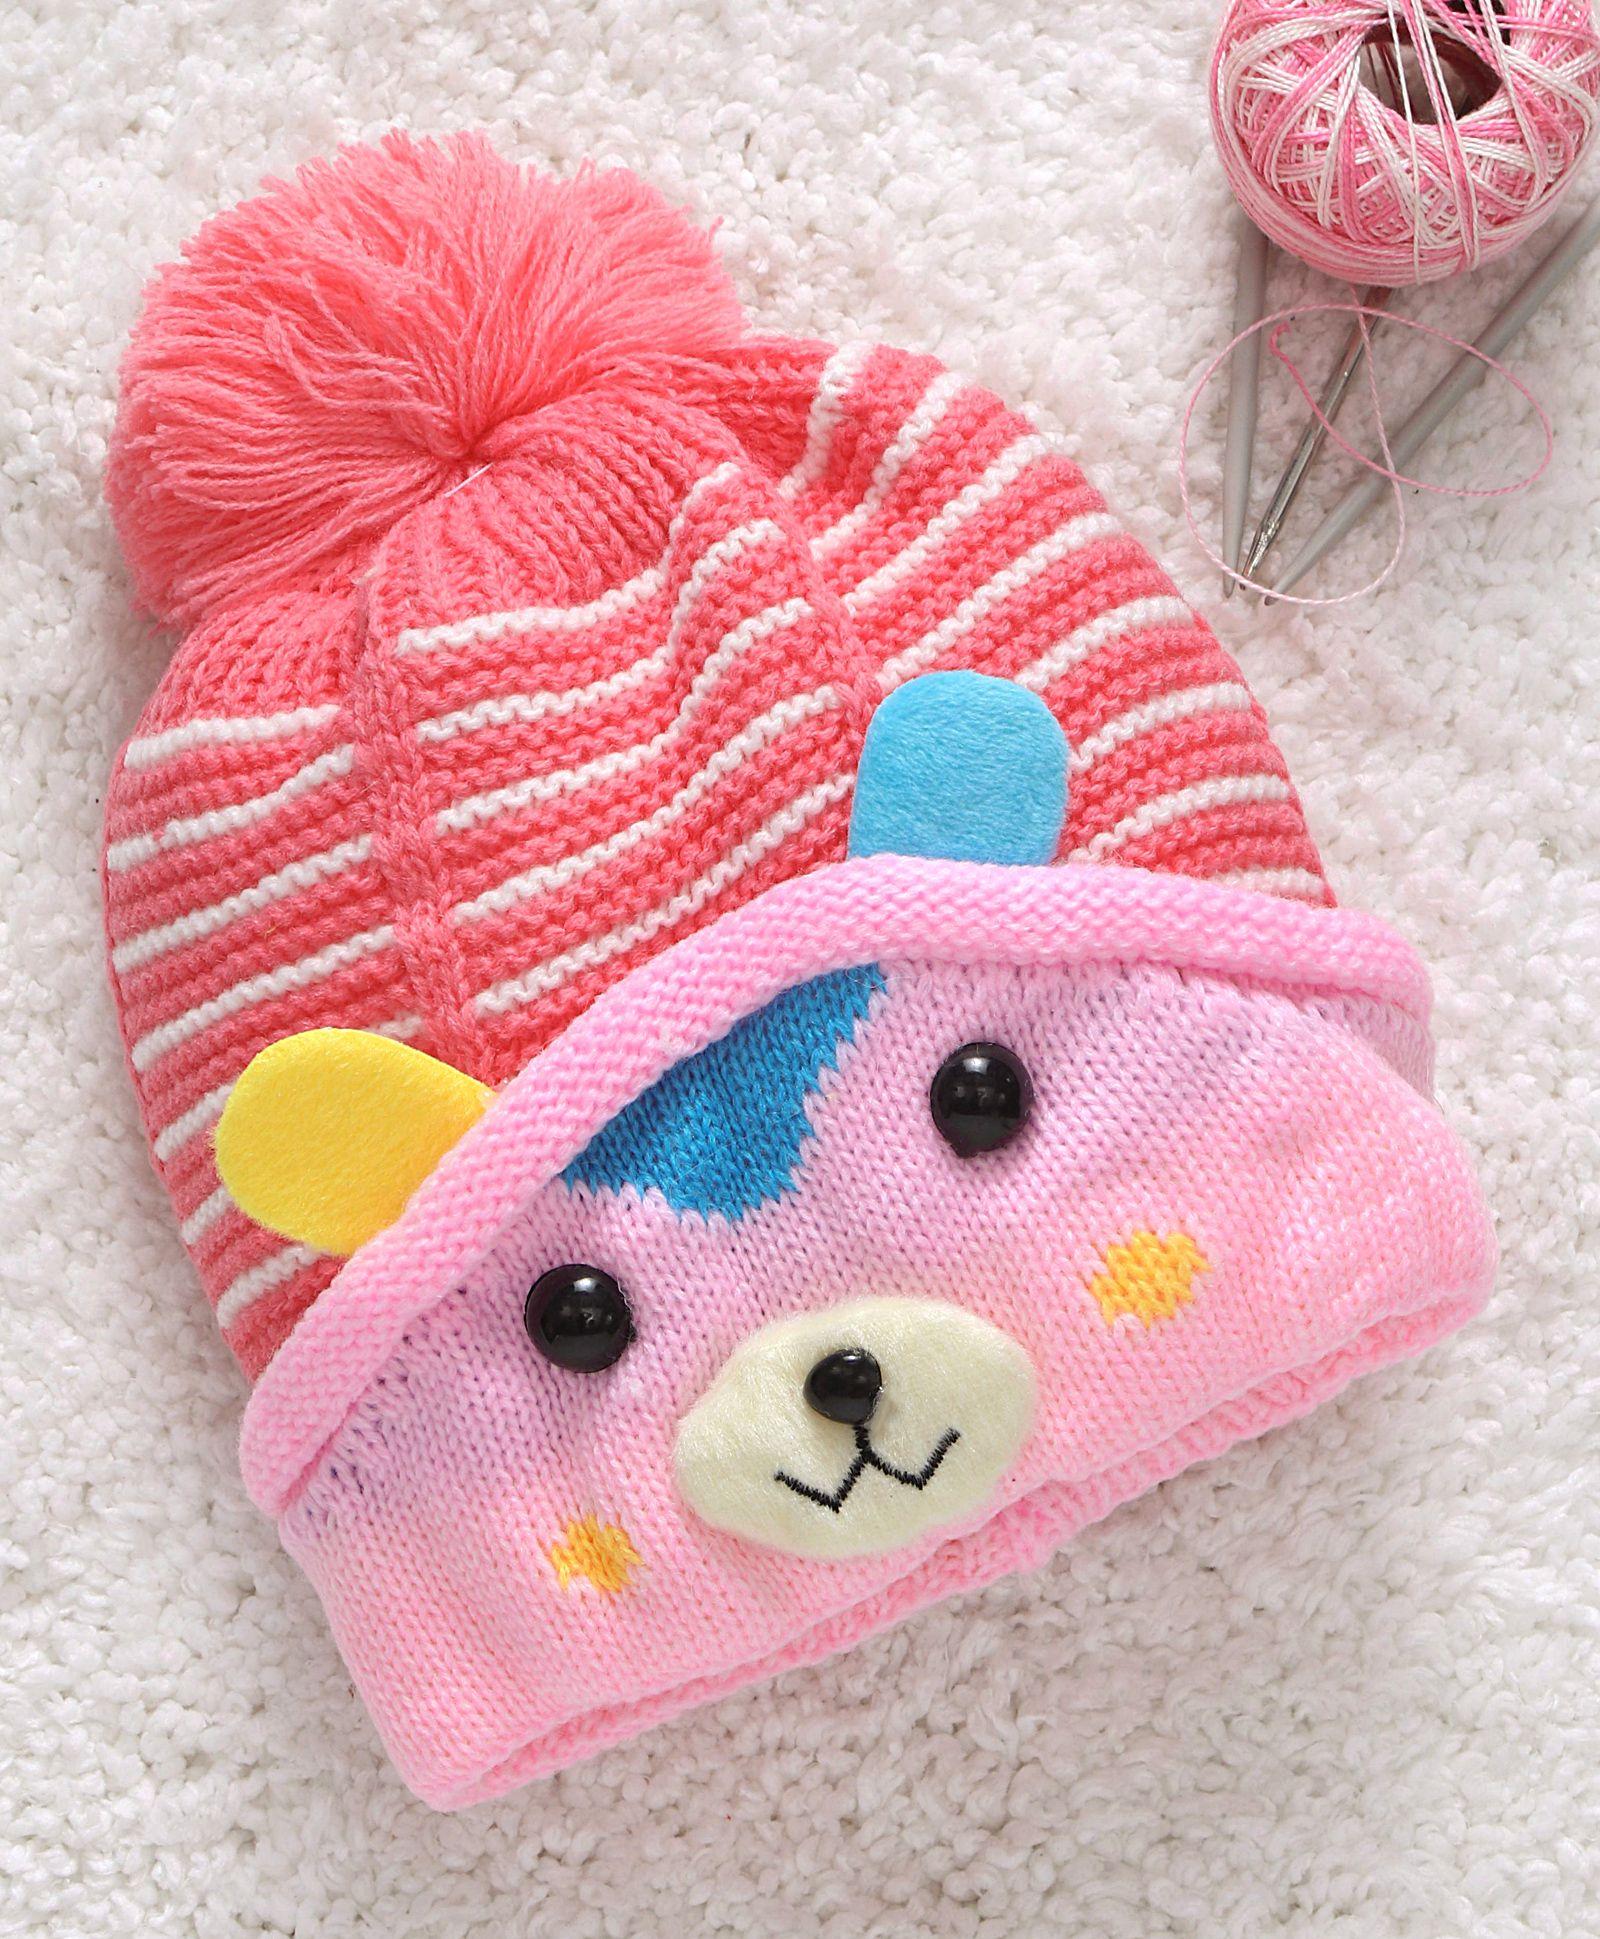 d2d7c08ec7d Babyhug Winter Wear Cap Bear Face Design Pink Online in India